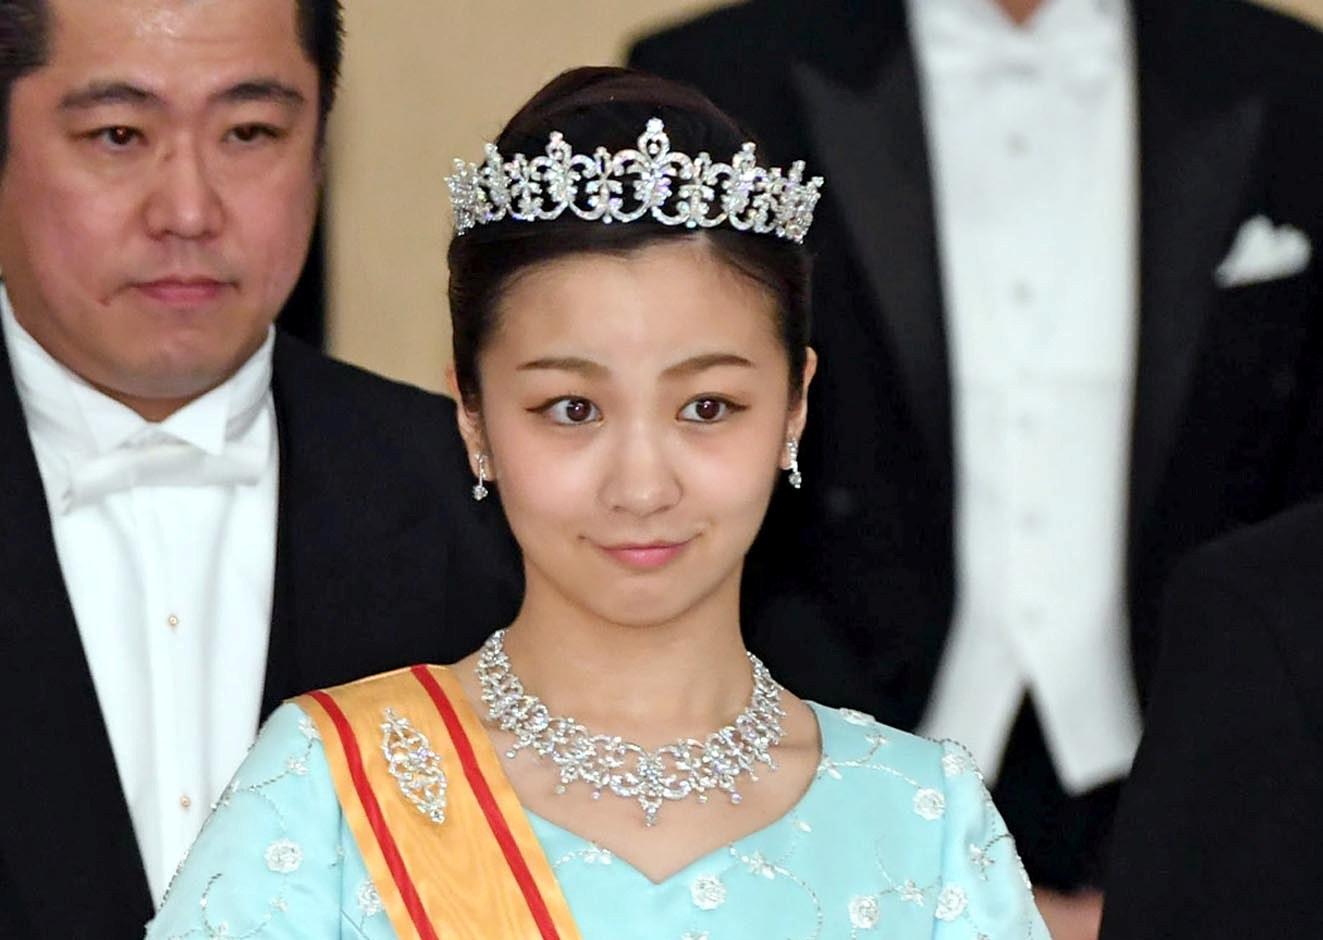 【産経新聞・代表撮影】スペイン国王夫妻迎え宮中晩餐会